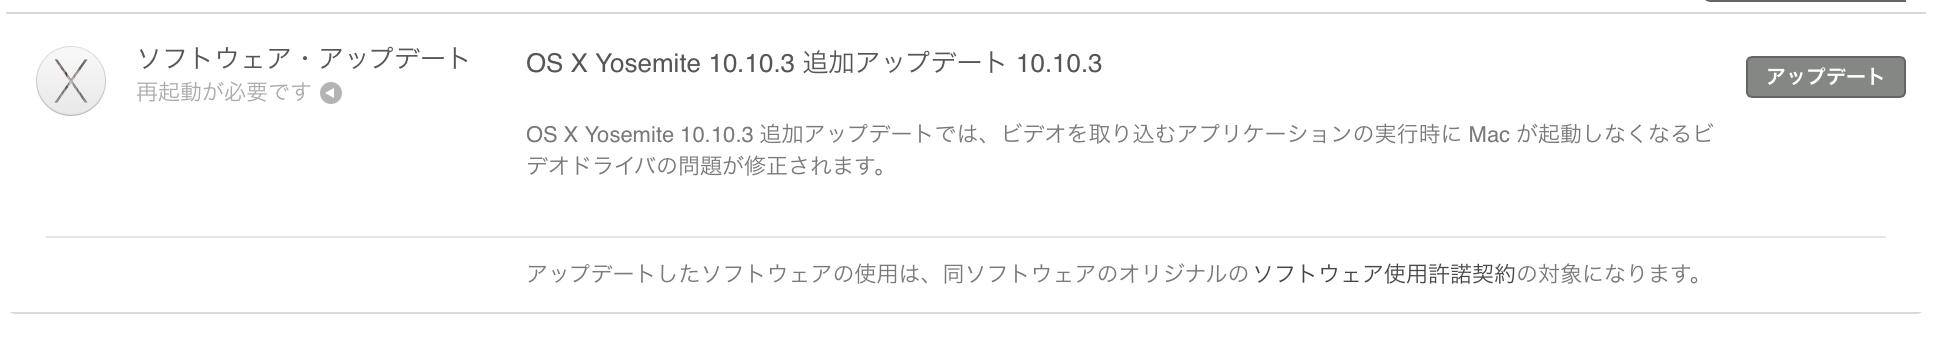 「OS X Yosemite 10.10.3」追加アップデートがリリース!ビデオドライバの問題が修正